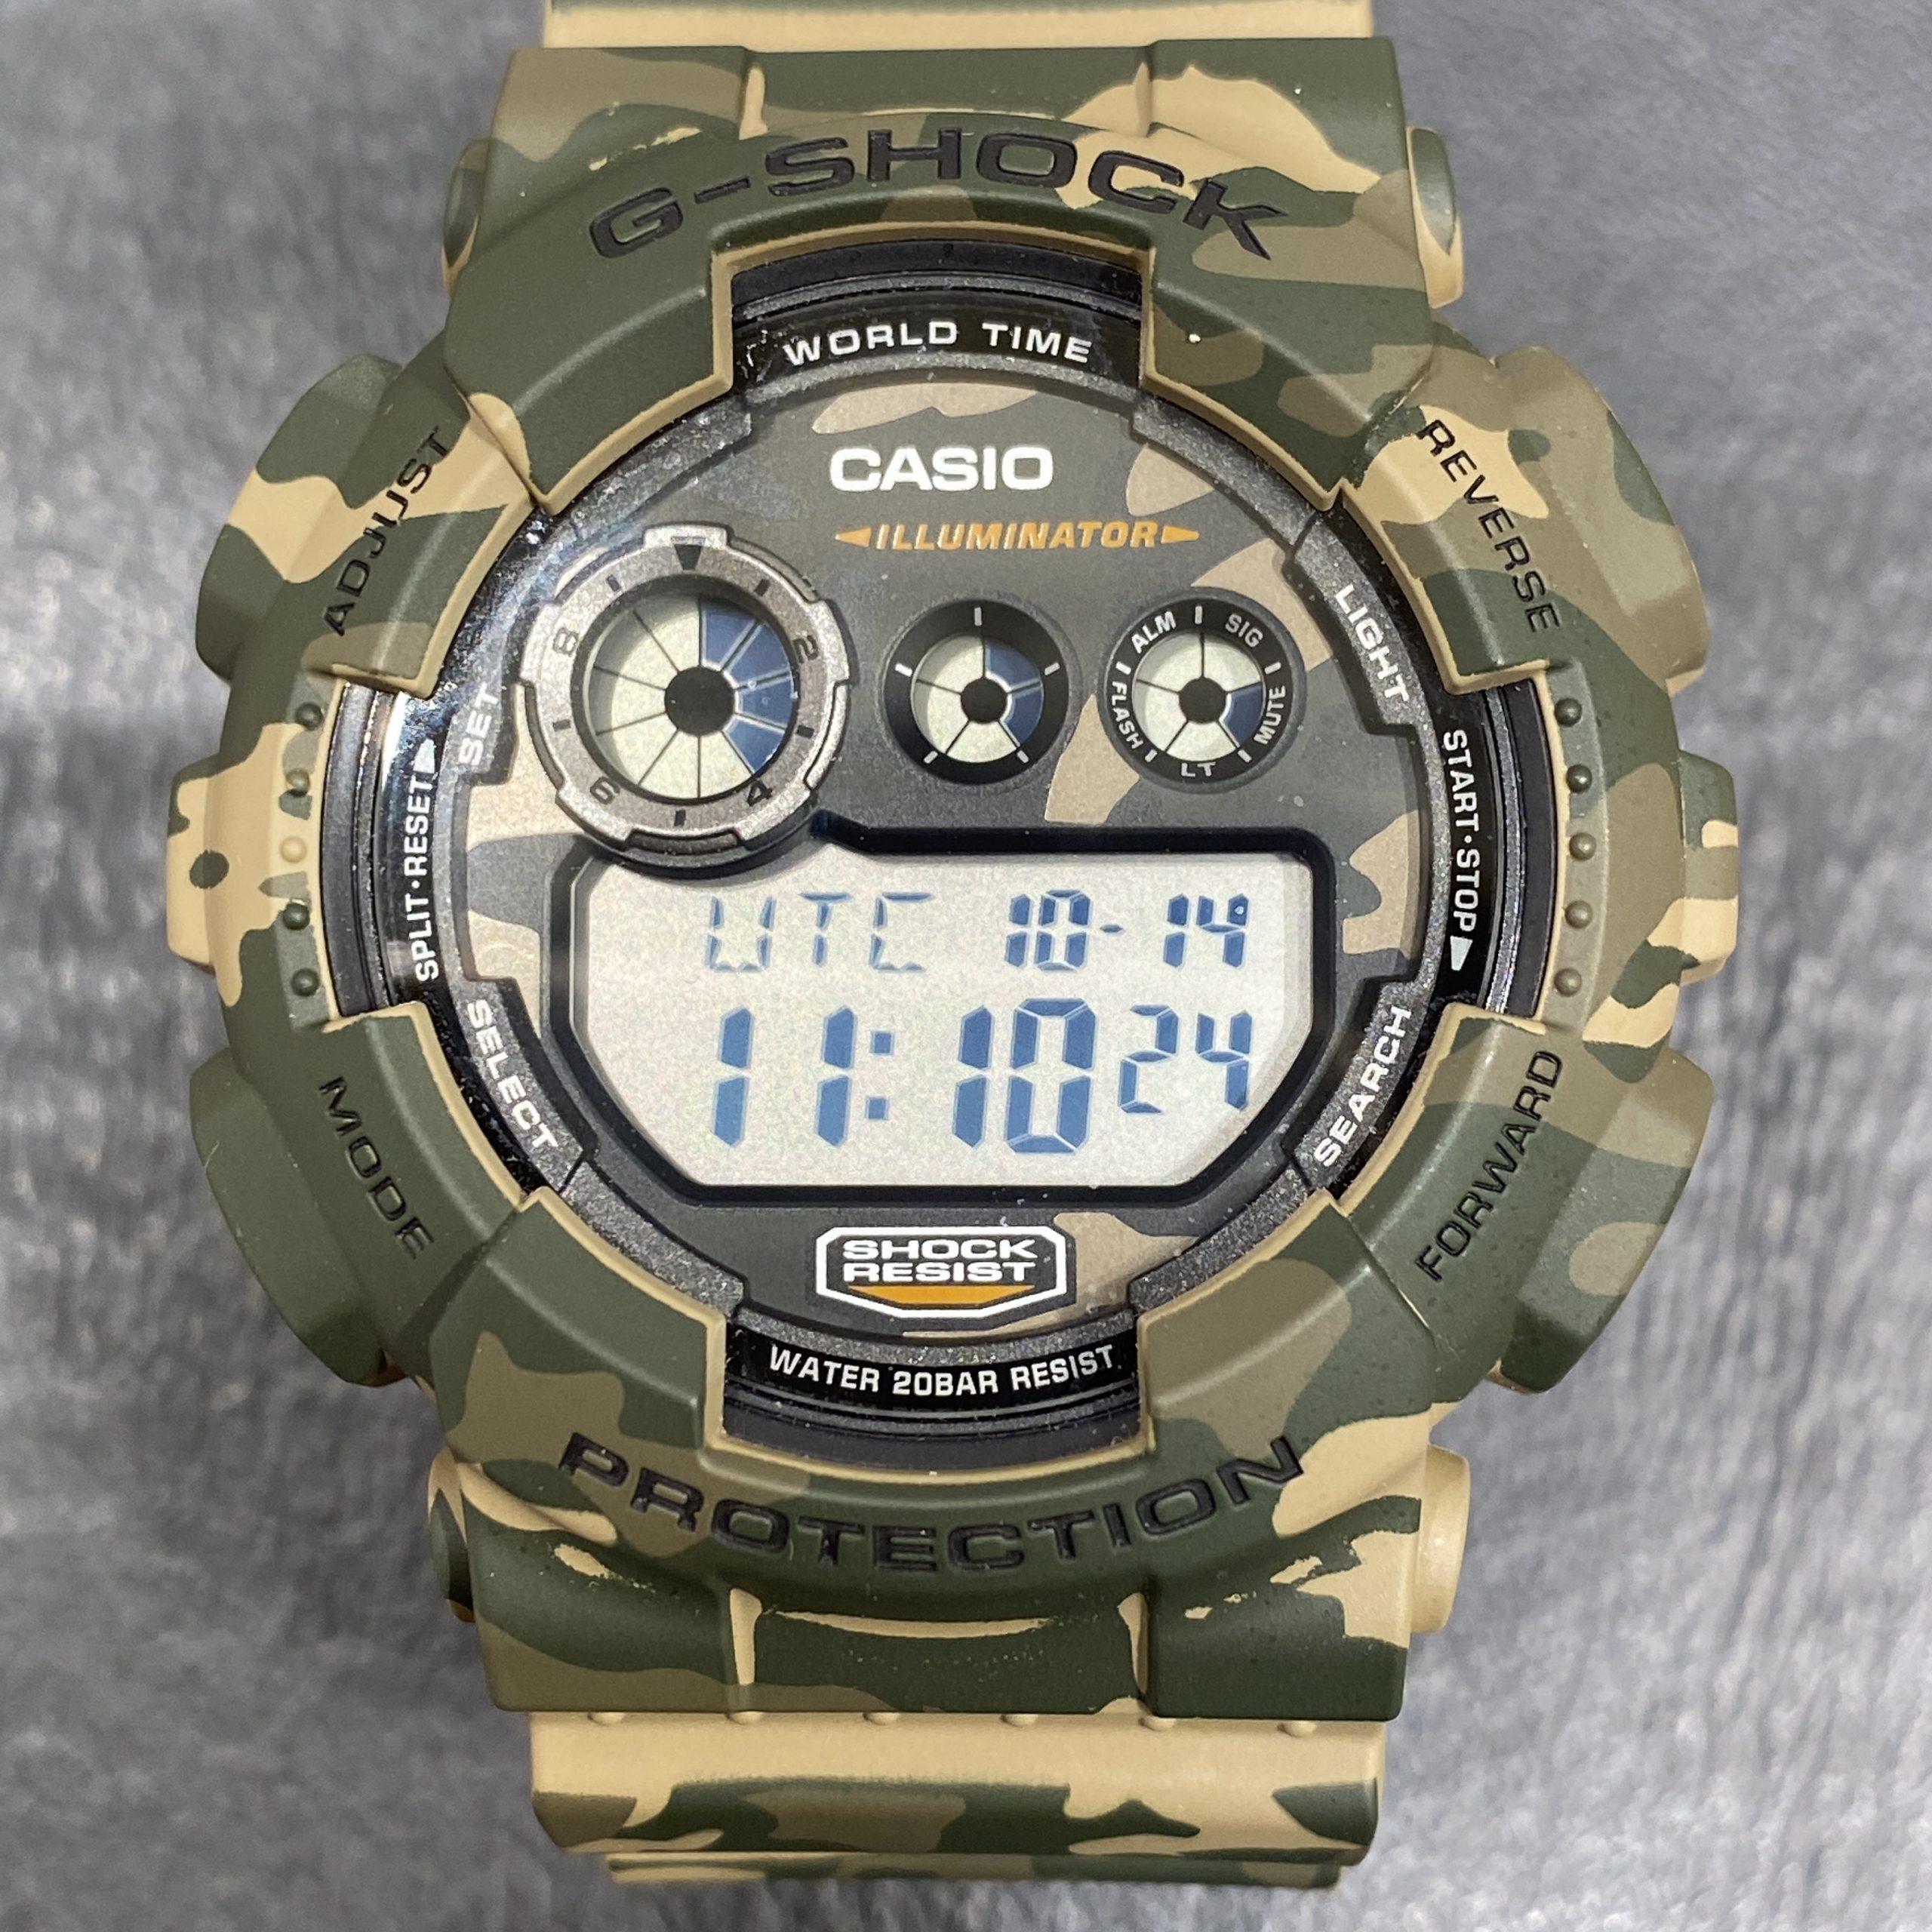 【CASIO/カシオ】G-SHOCK/ジーショック RESIST アナデジ腕時計 GD-120CM